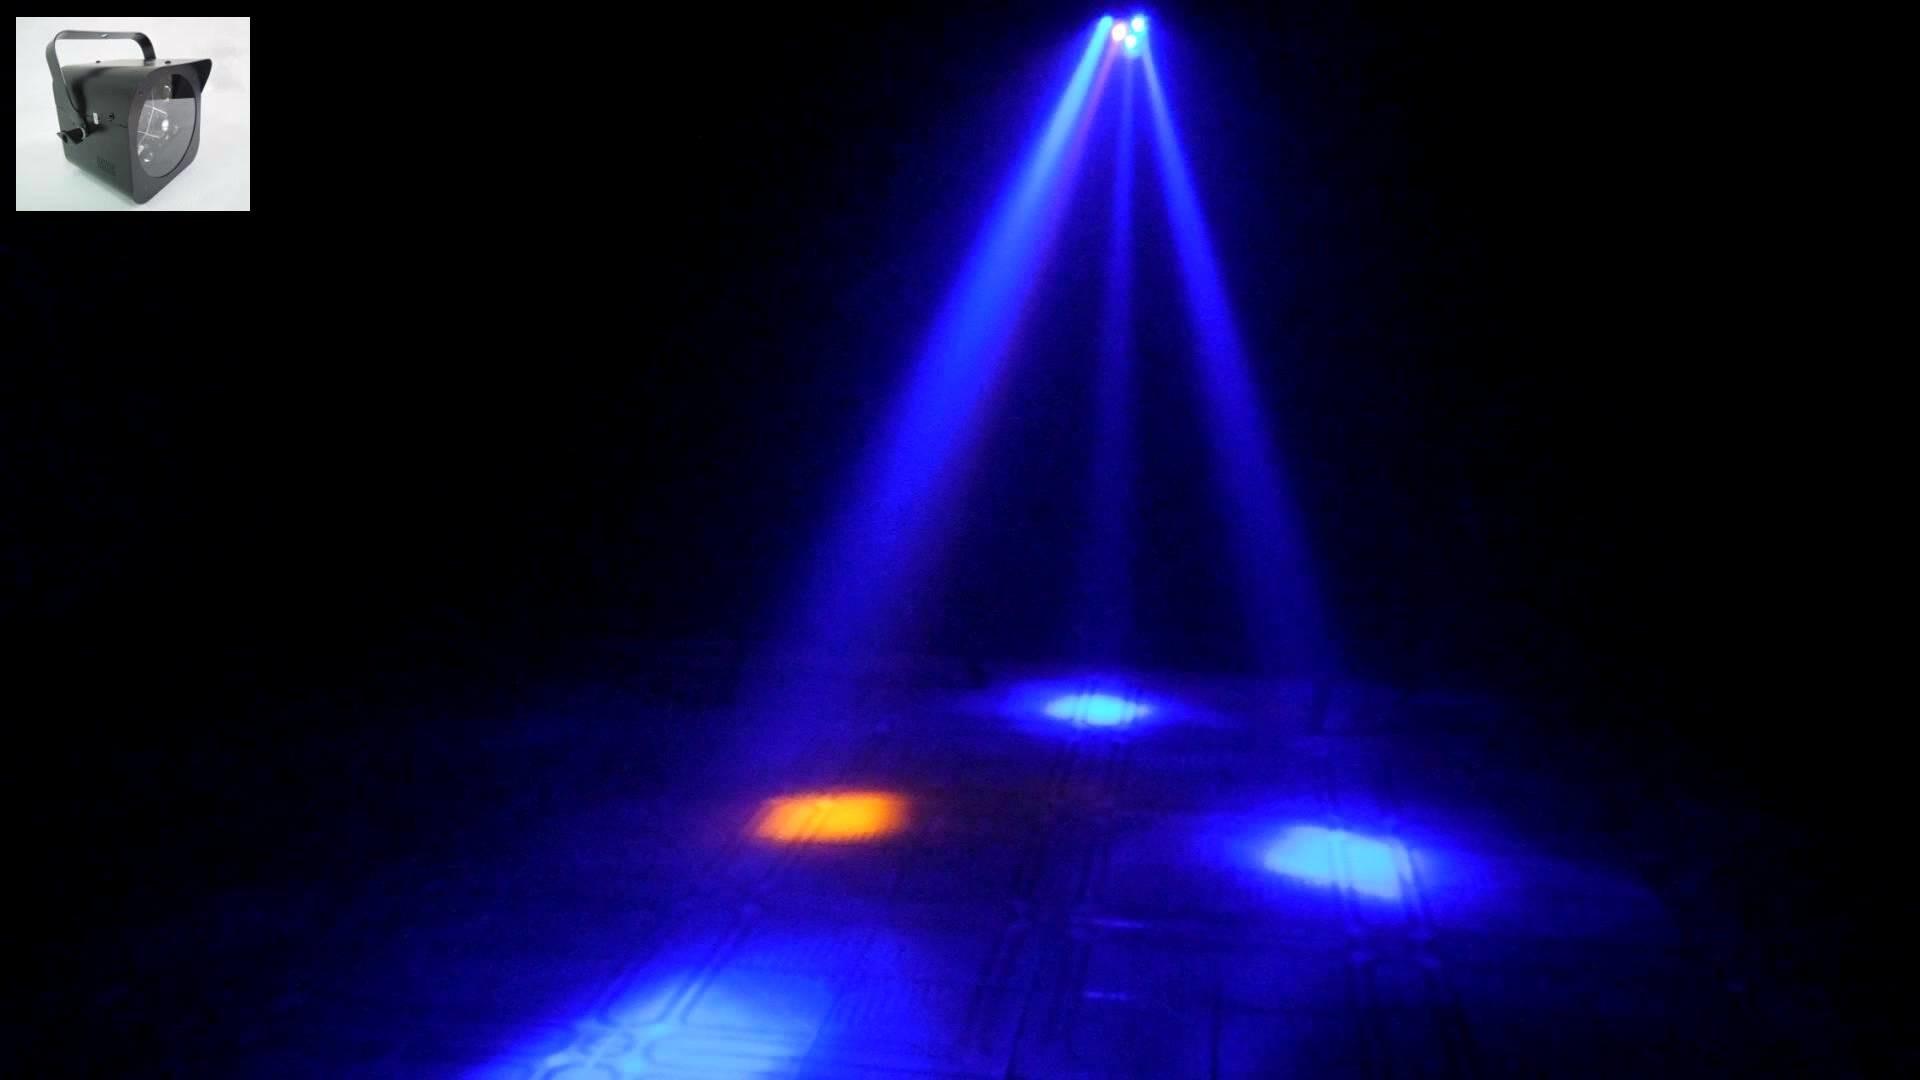 2015 4 in 1 RGBA stage light 5pcs*10W Led Moving effect DJ Lights DMX 9  Channels for Disco Bar Pub